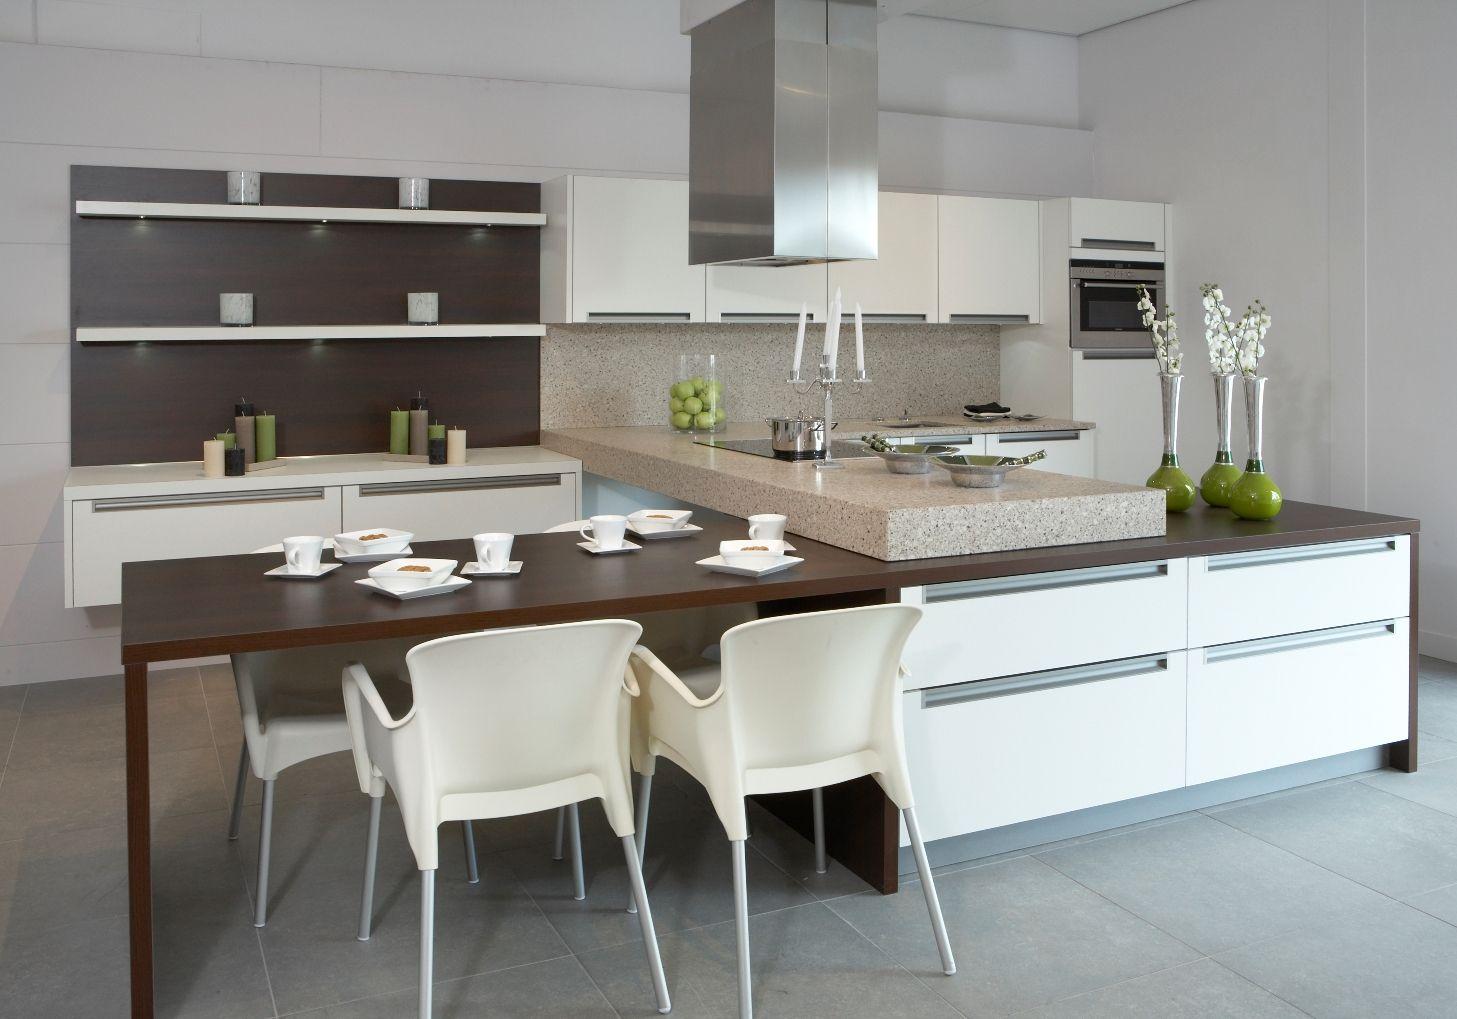 Keuken ontwerp eettafel eiland - Moderne keukentafel ...